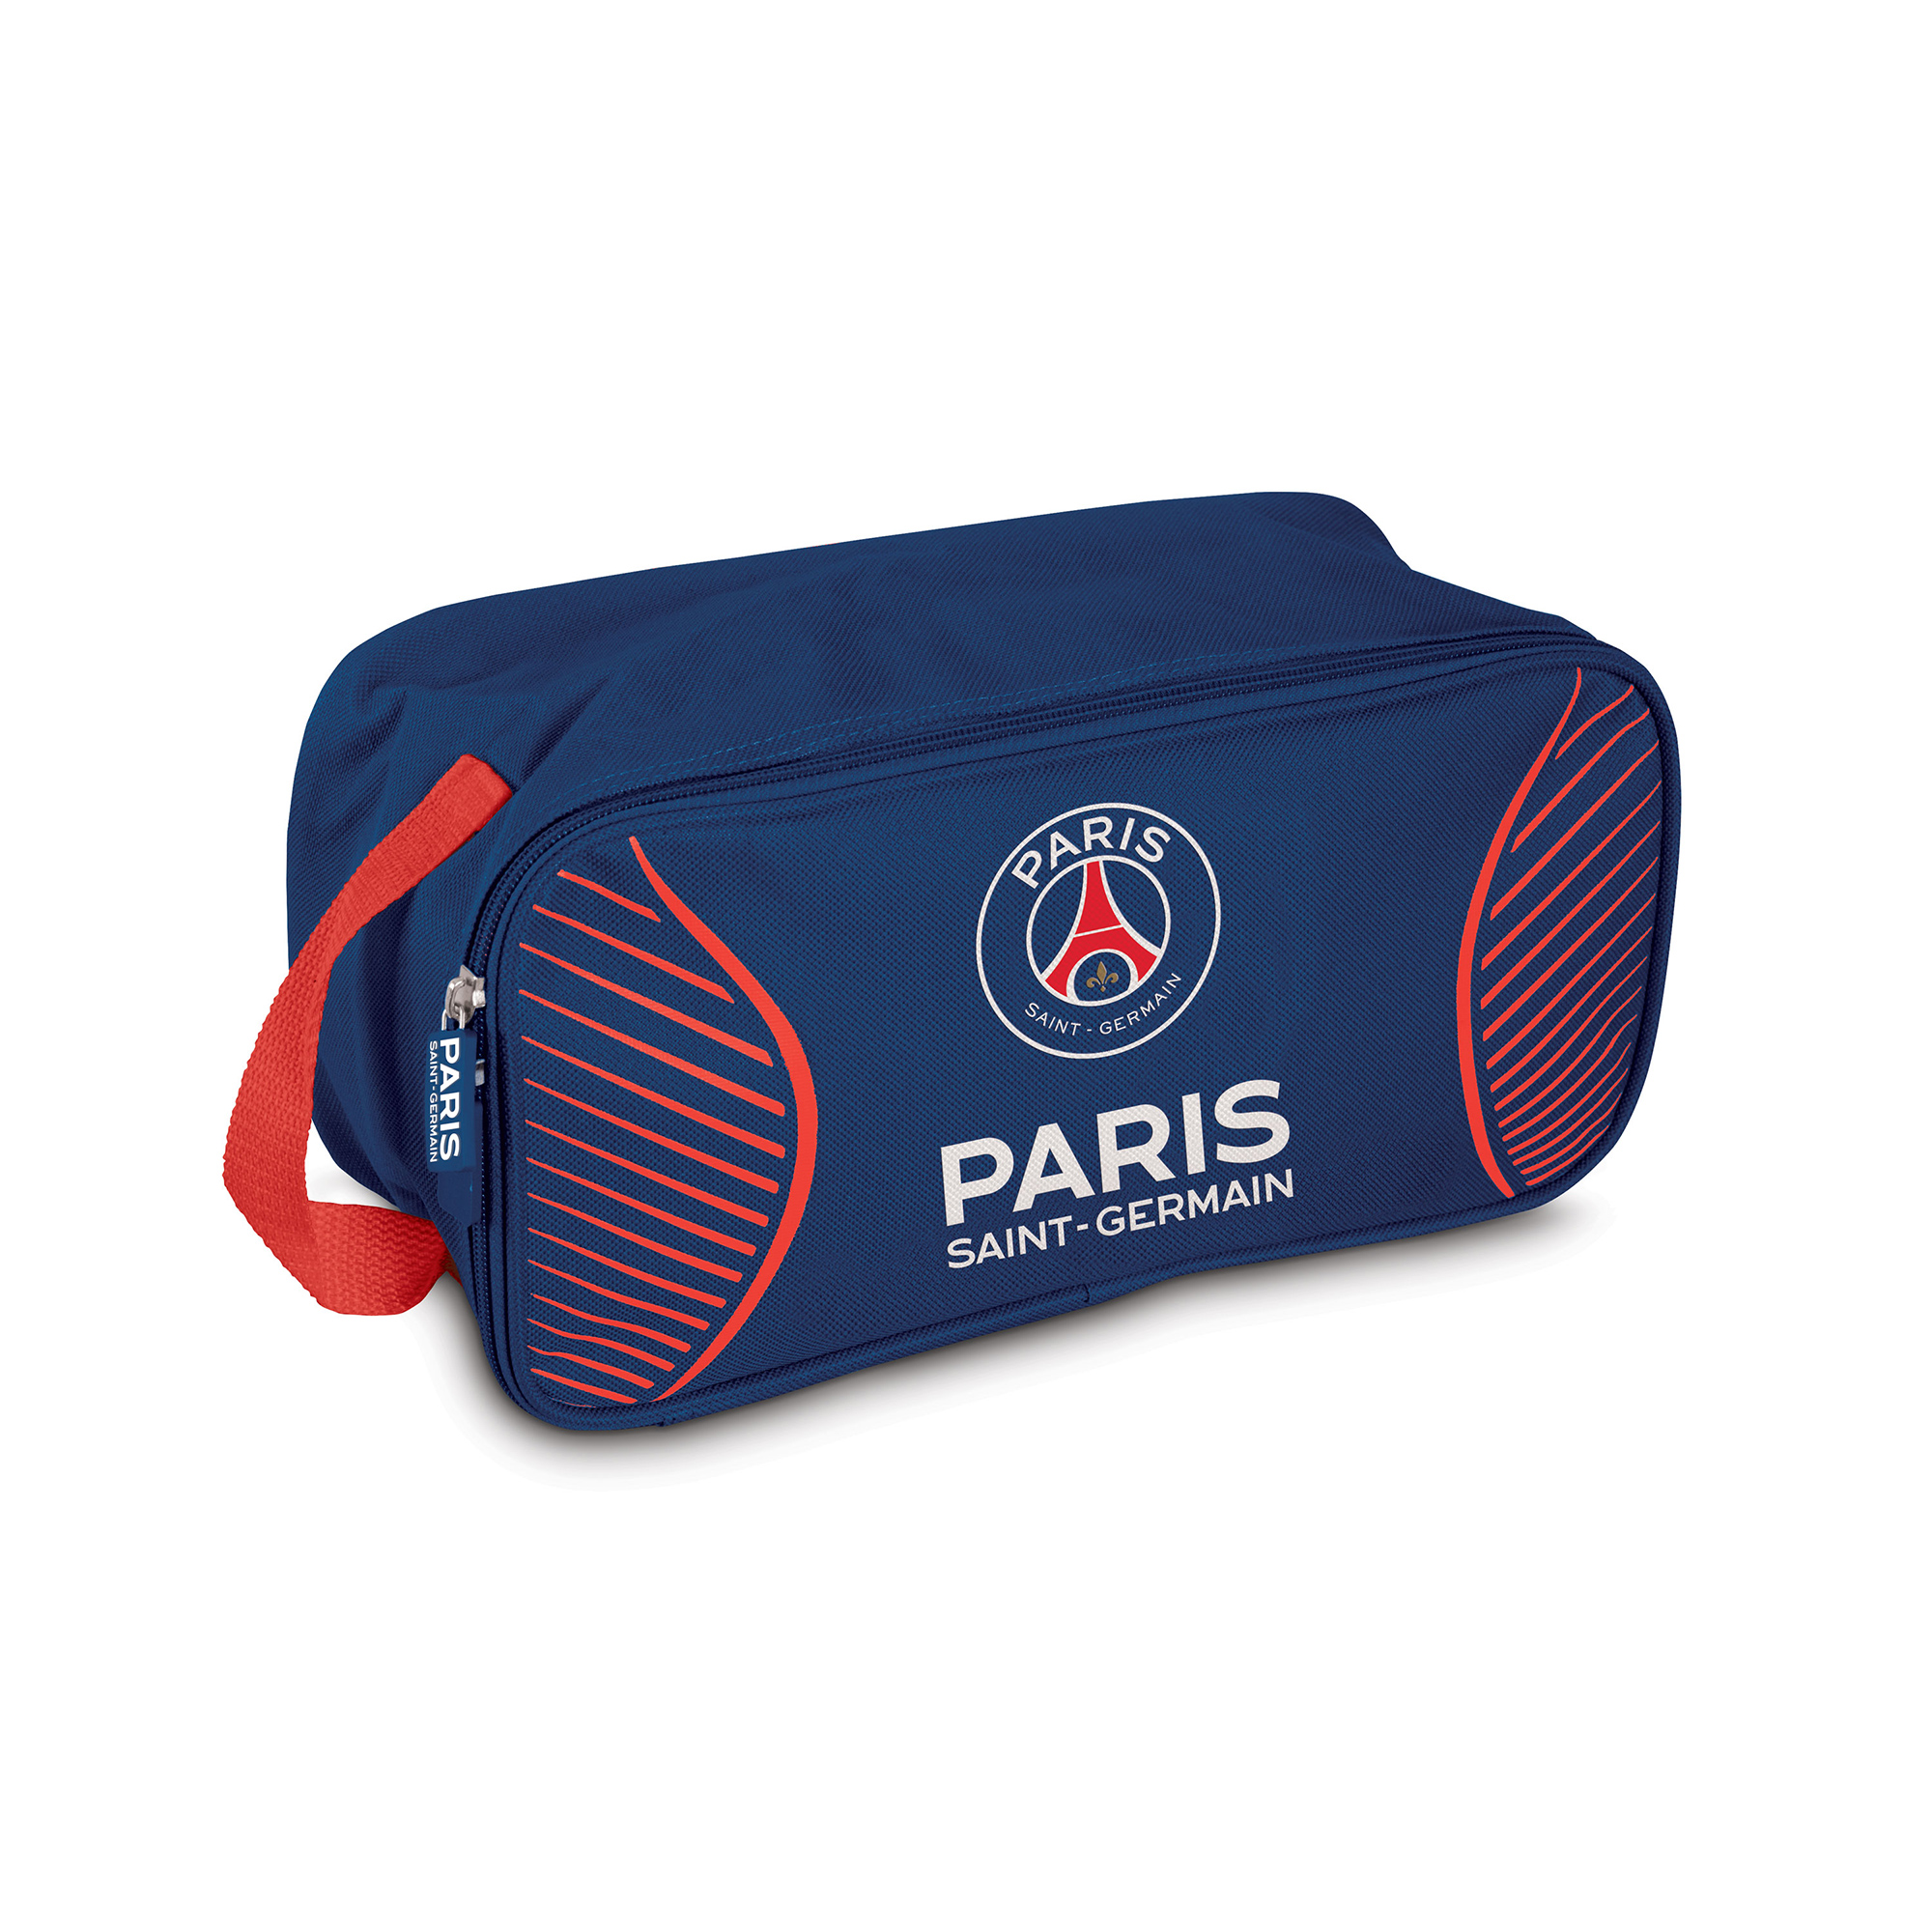 Paris Saint-Germain Crest Boot Bag